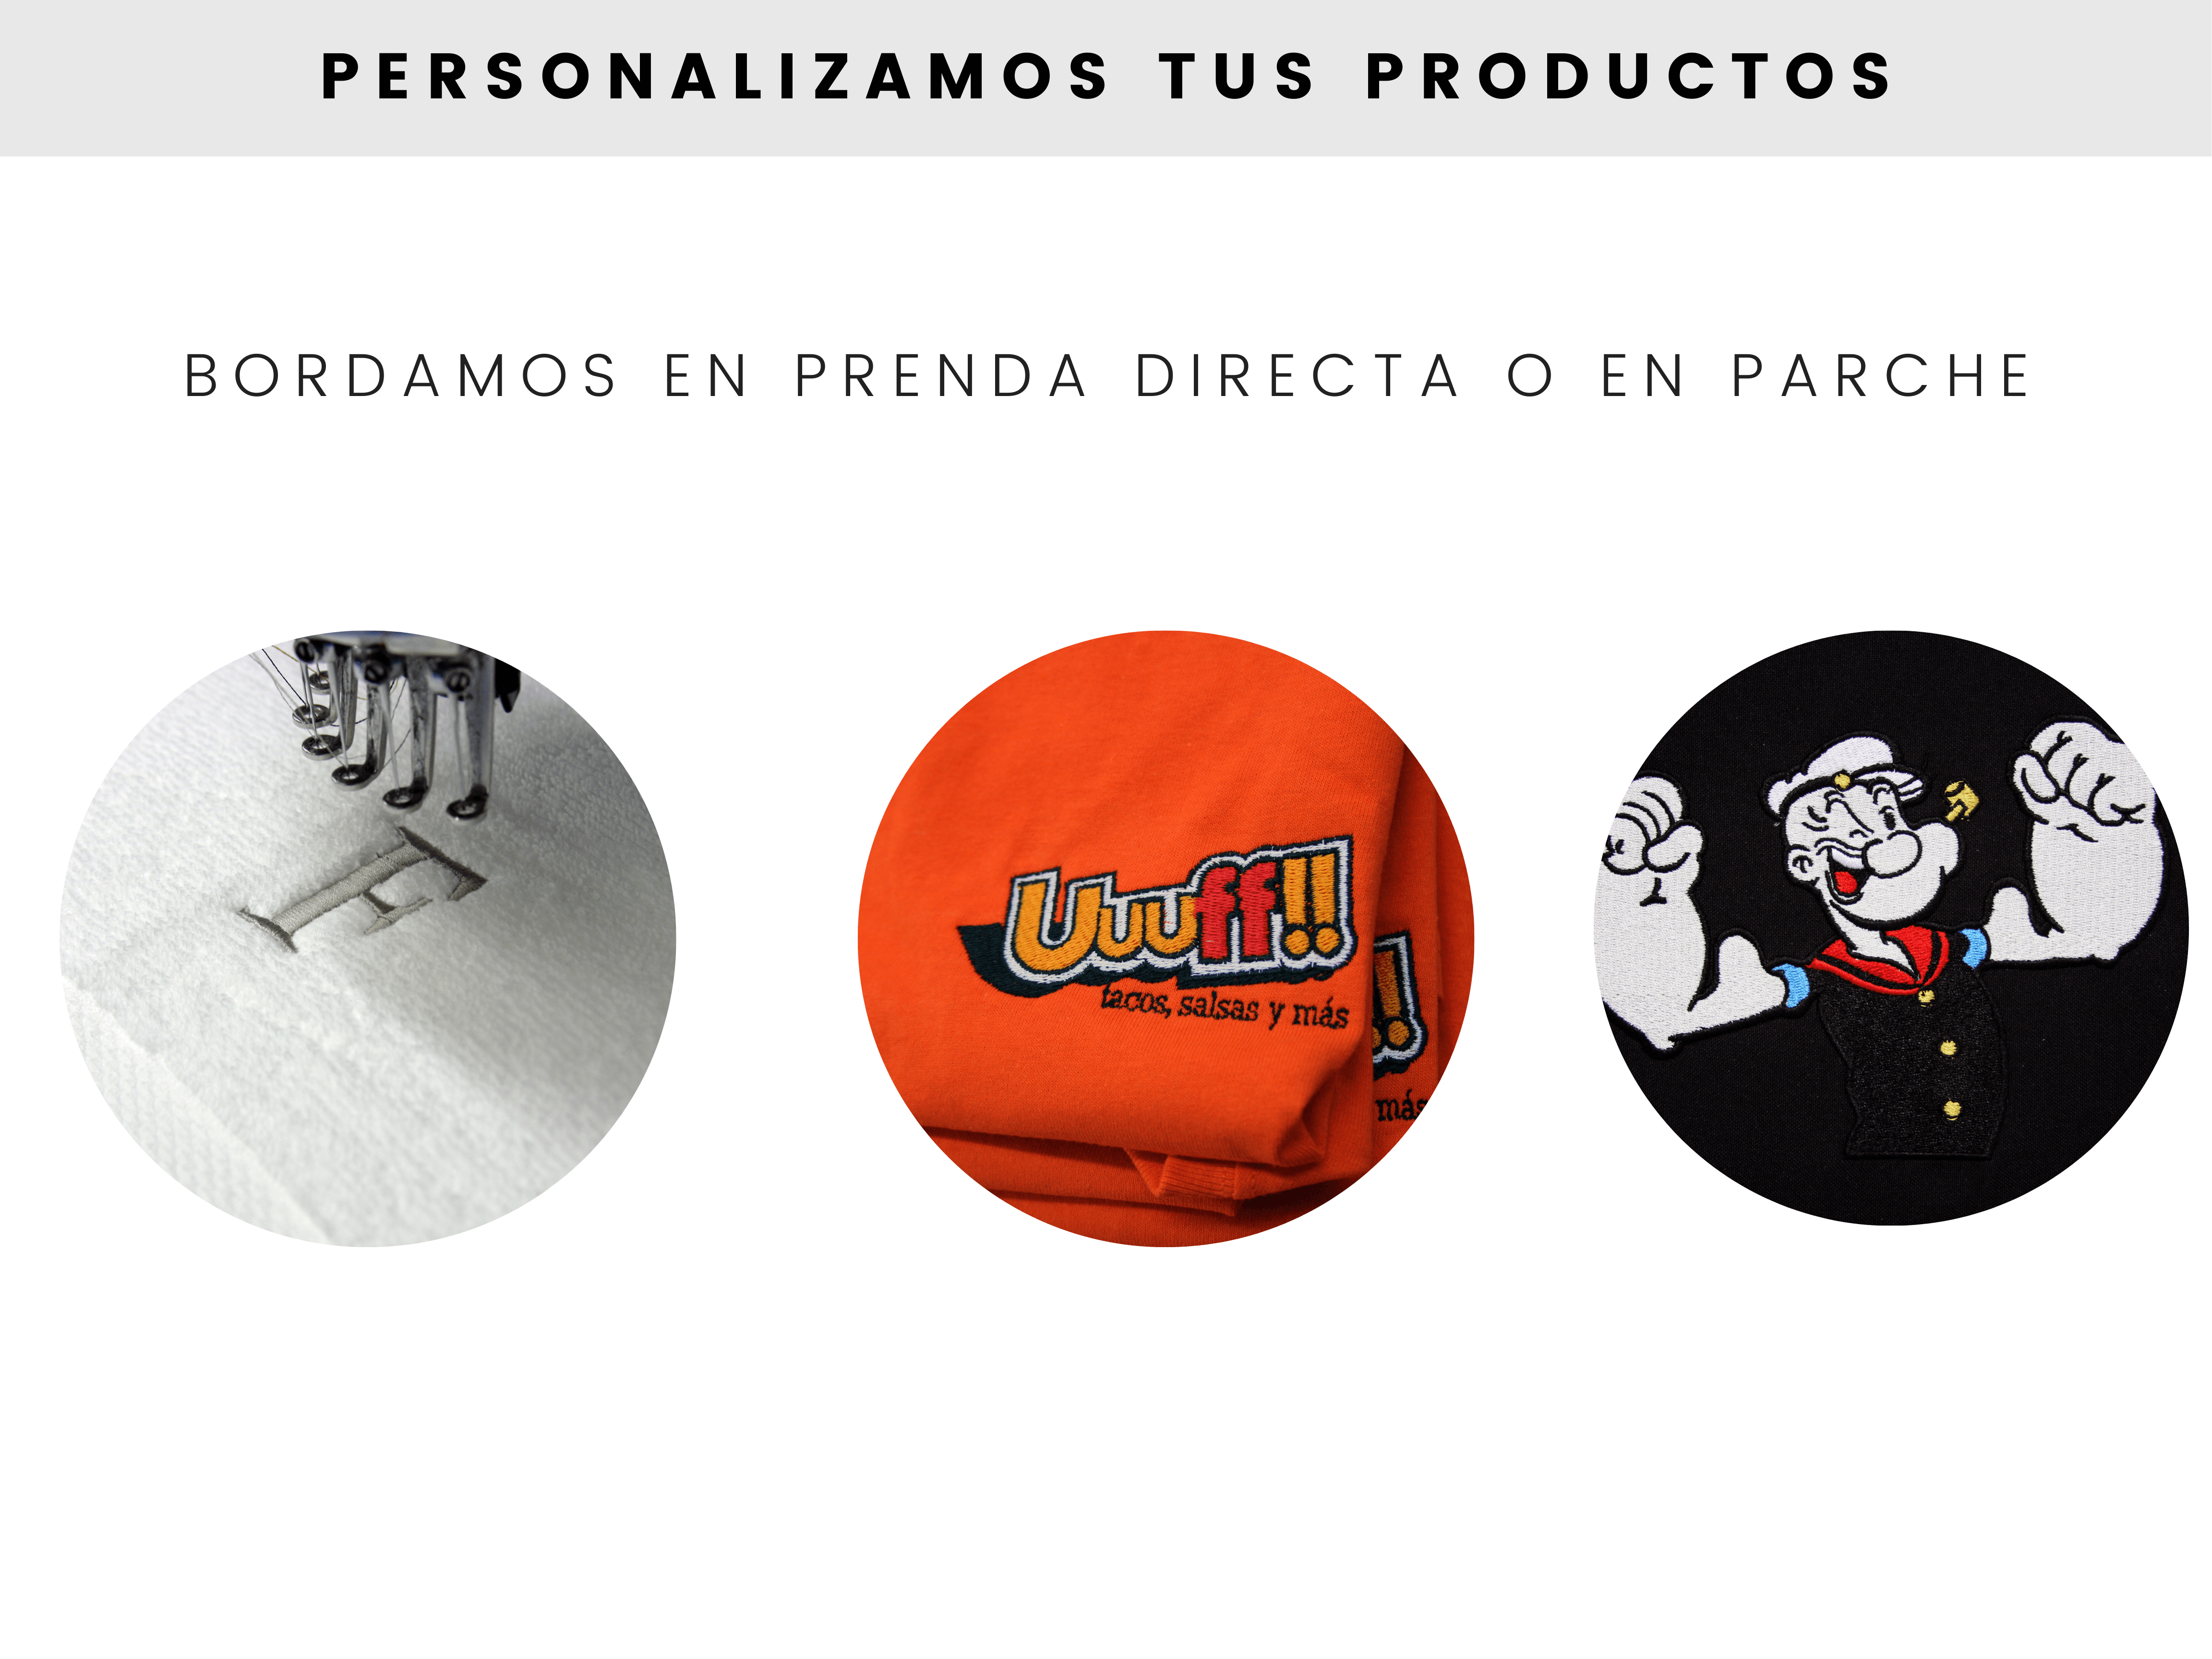 Personalizamos tus productos